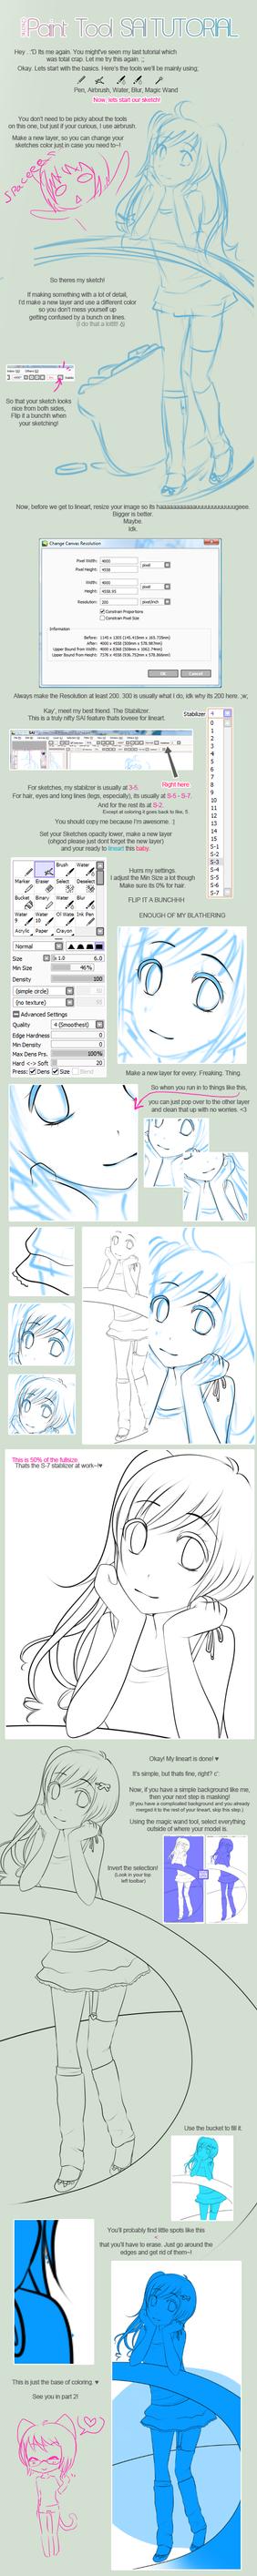 SAI: Anime Tutorial Part 1 by Aninion